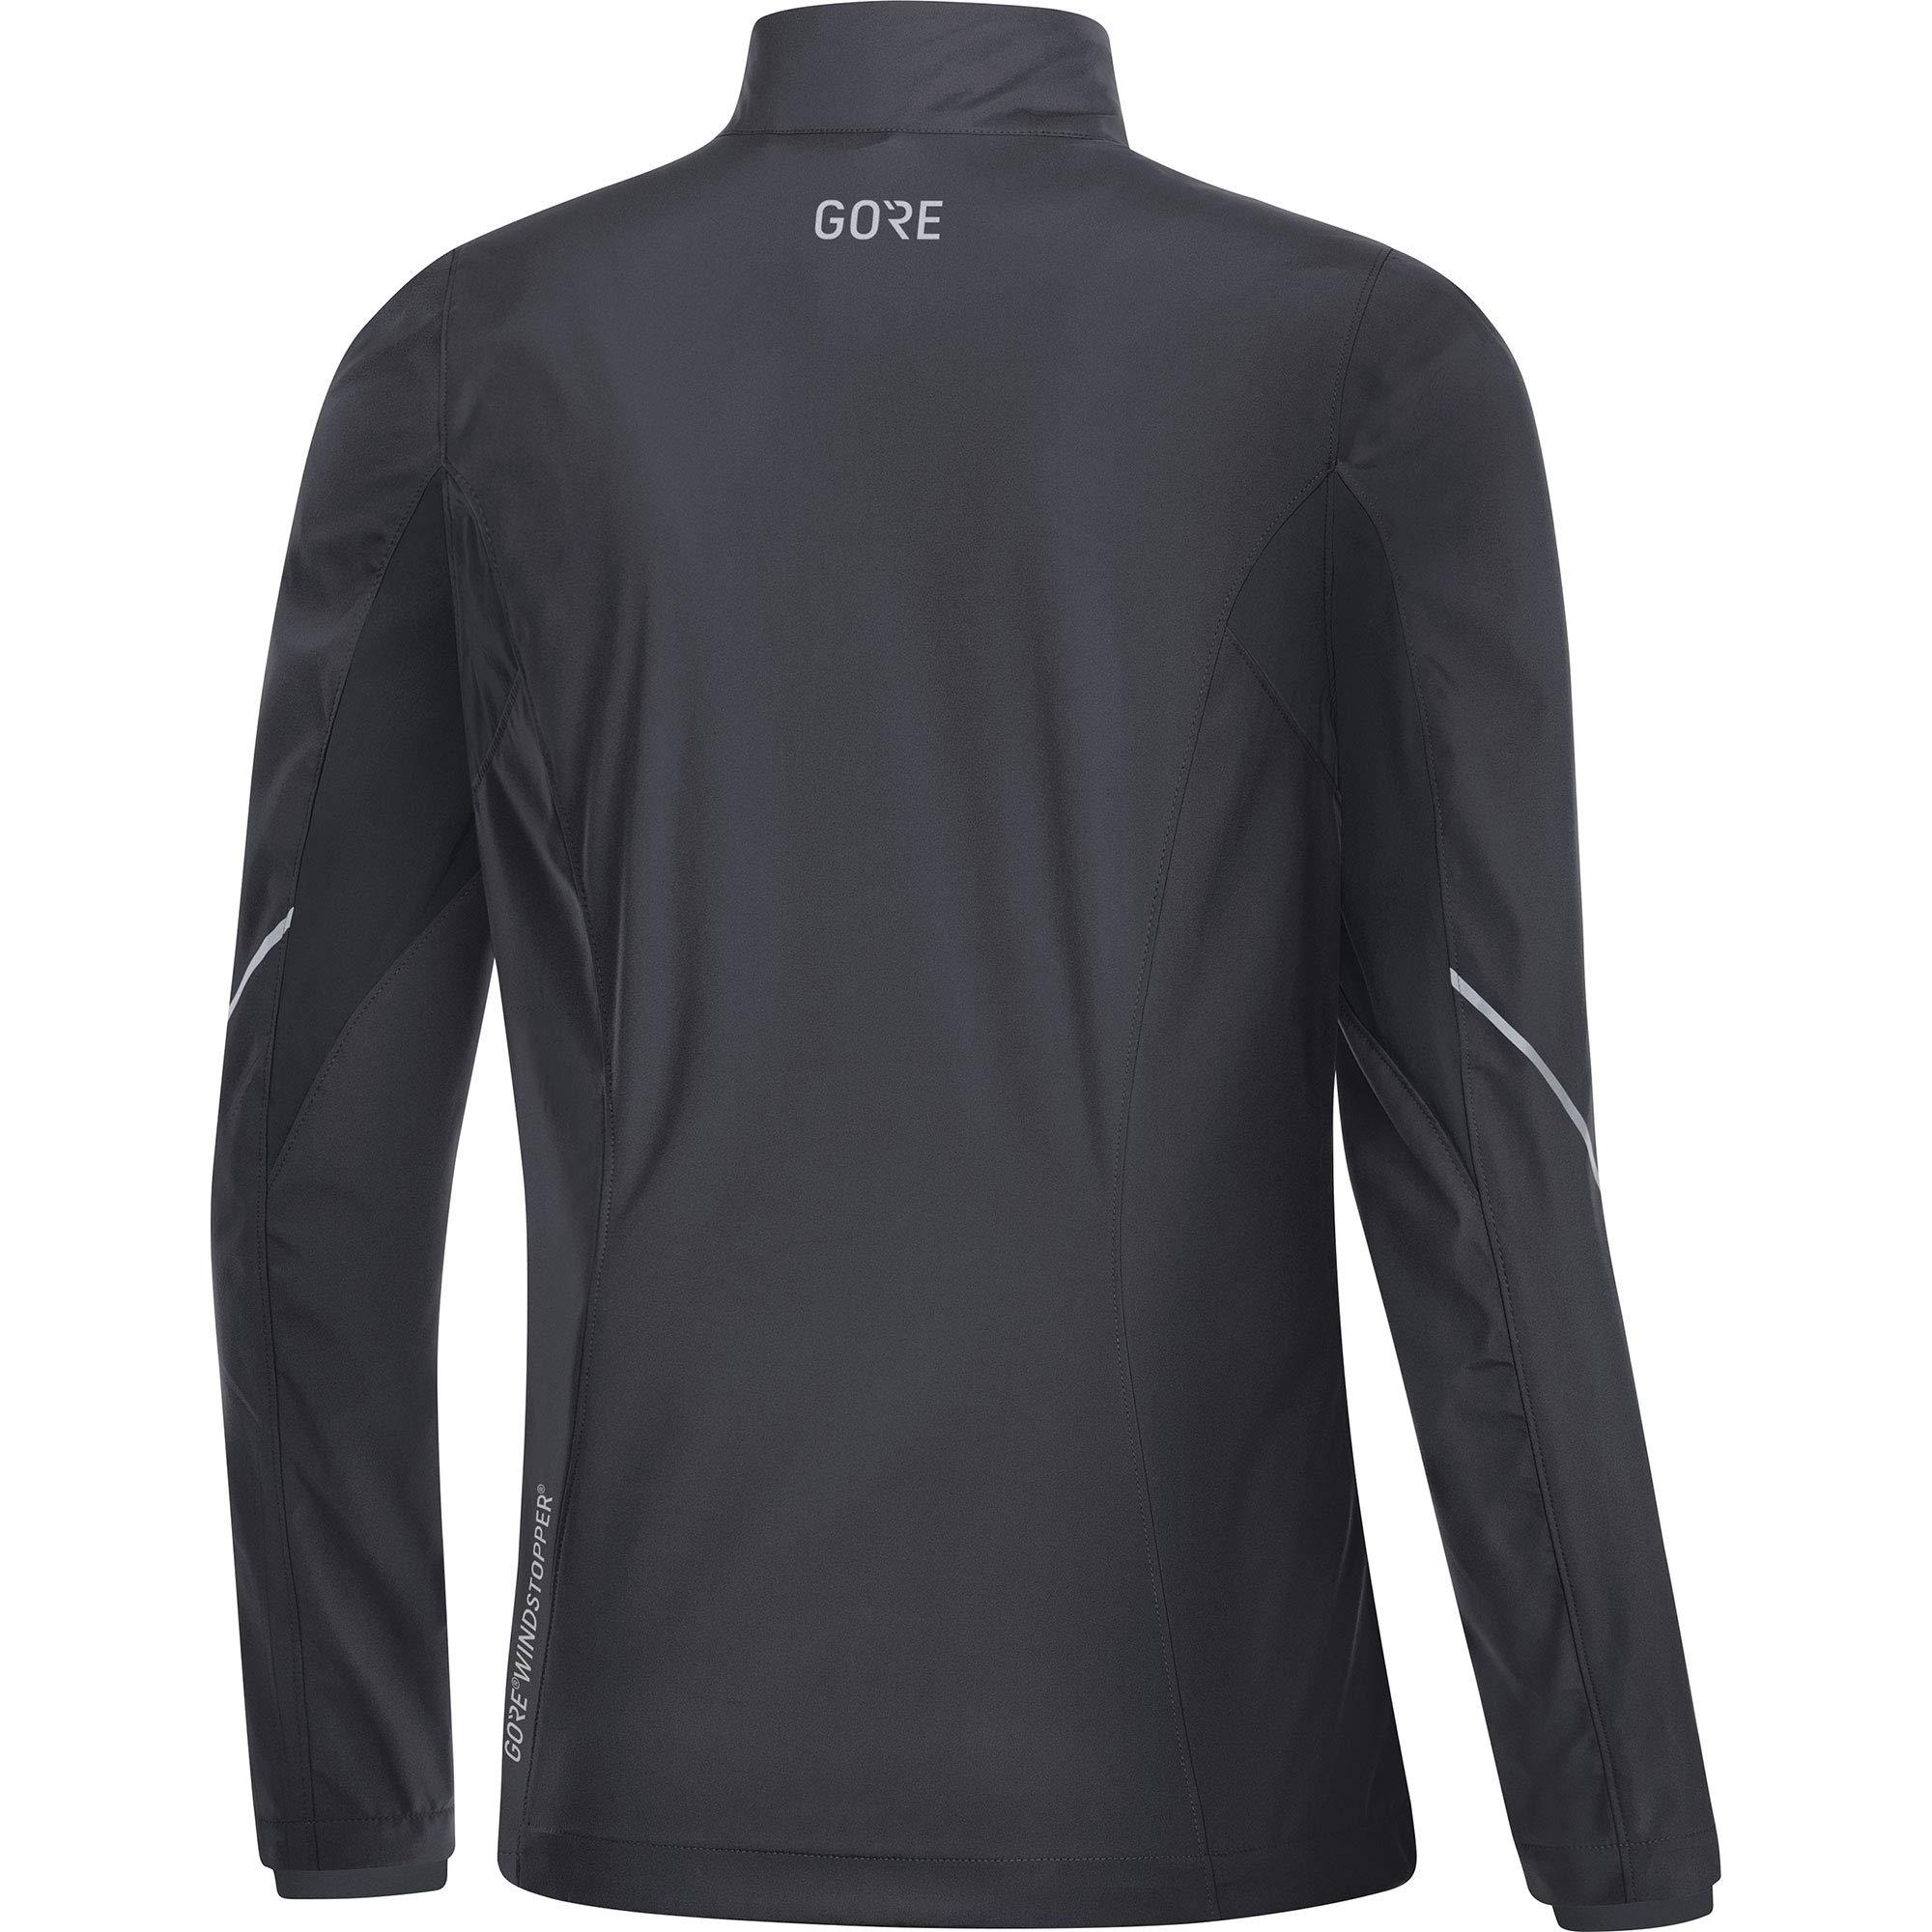 Gore Women's R3 Wmn Partial Gws Jacket,  terra grey/black,  M by GORE WEAR (Image #4)